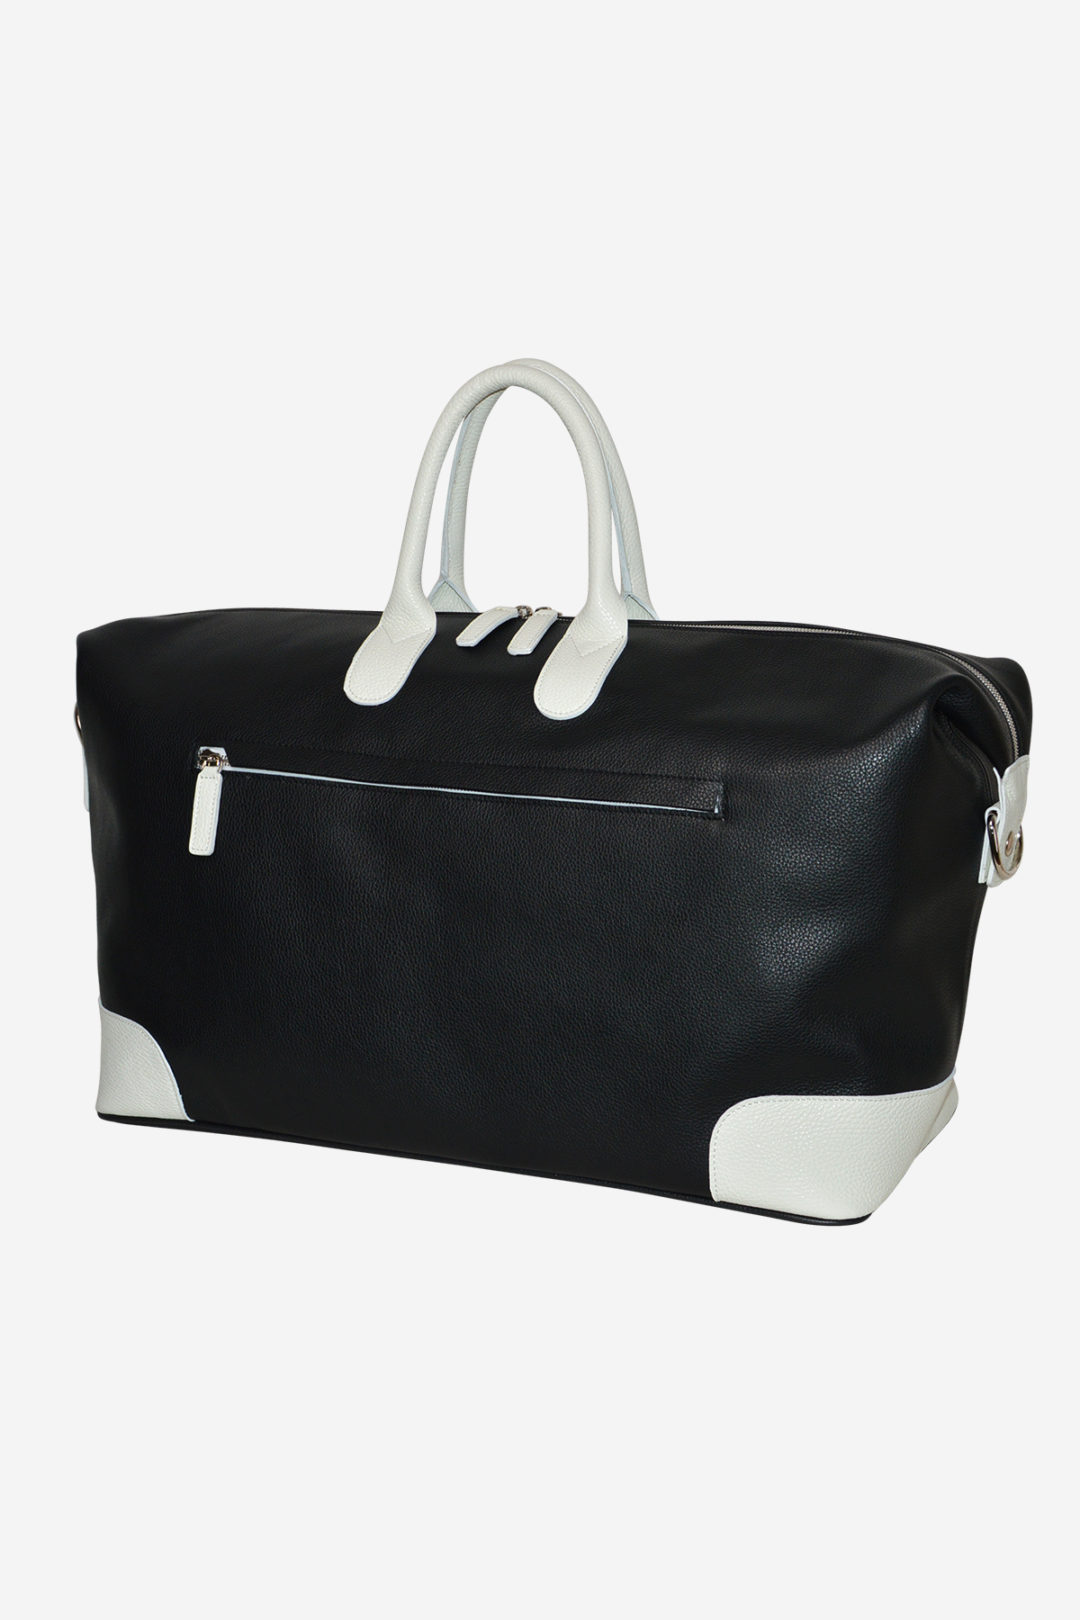 Antique Duffle Bag 038